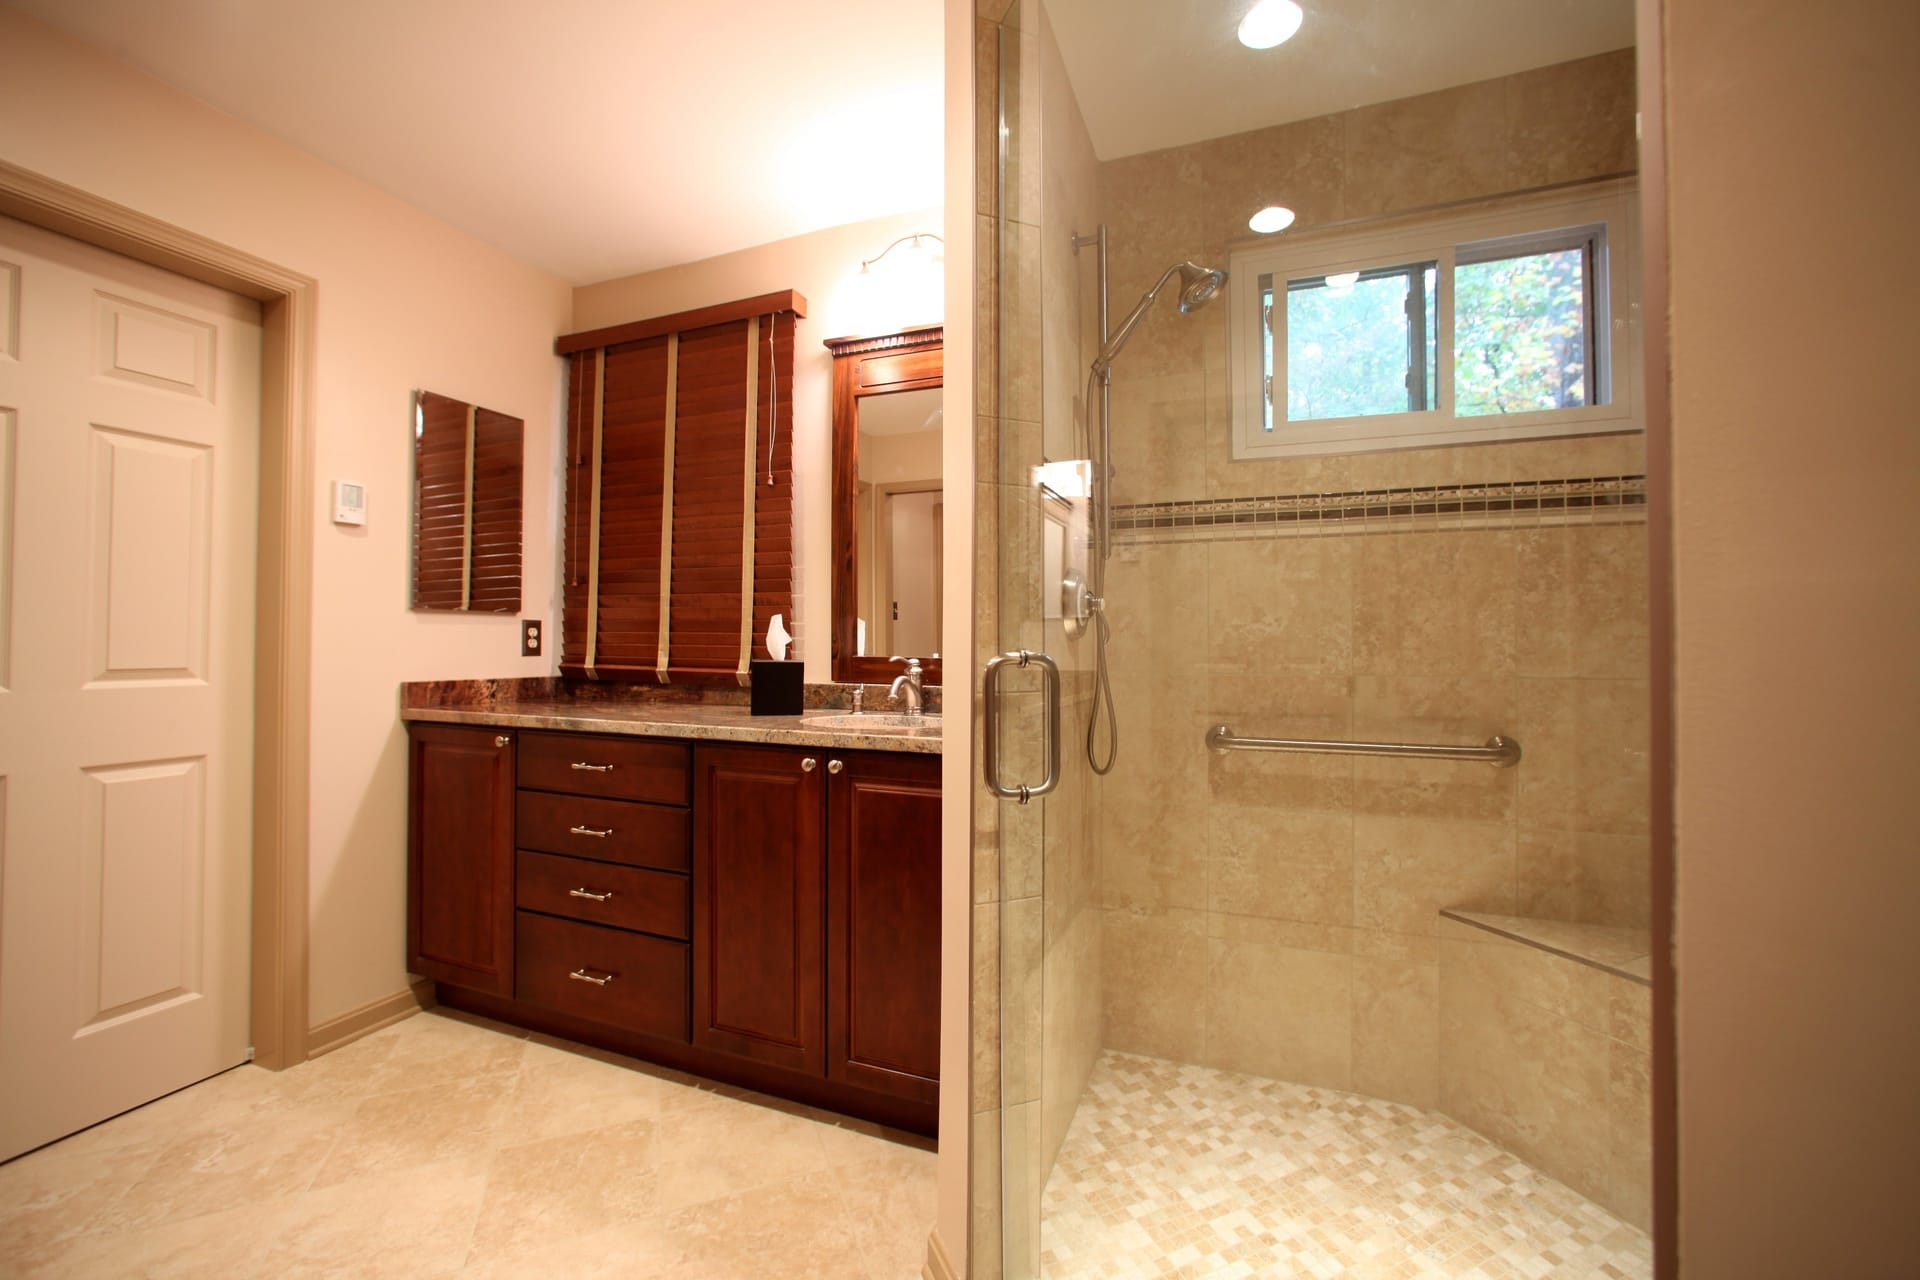 Bathroom Remodel - Hambleton Construction (2)